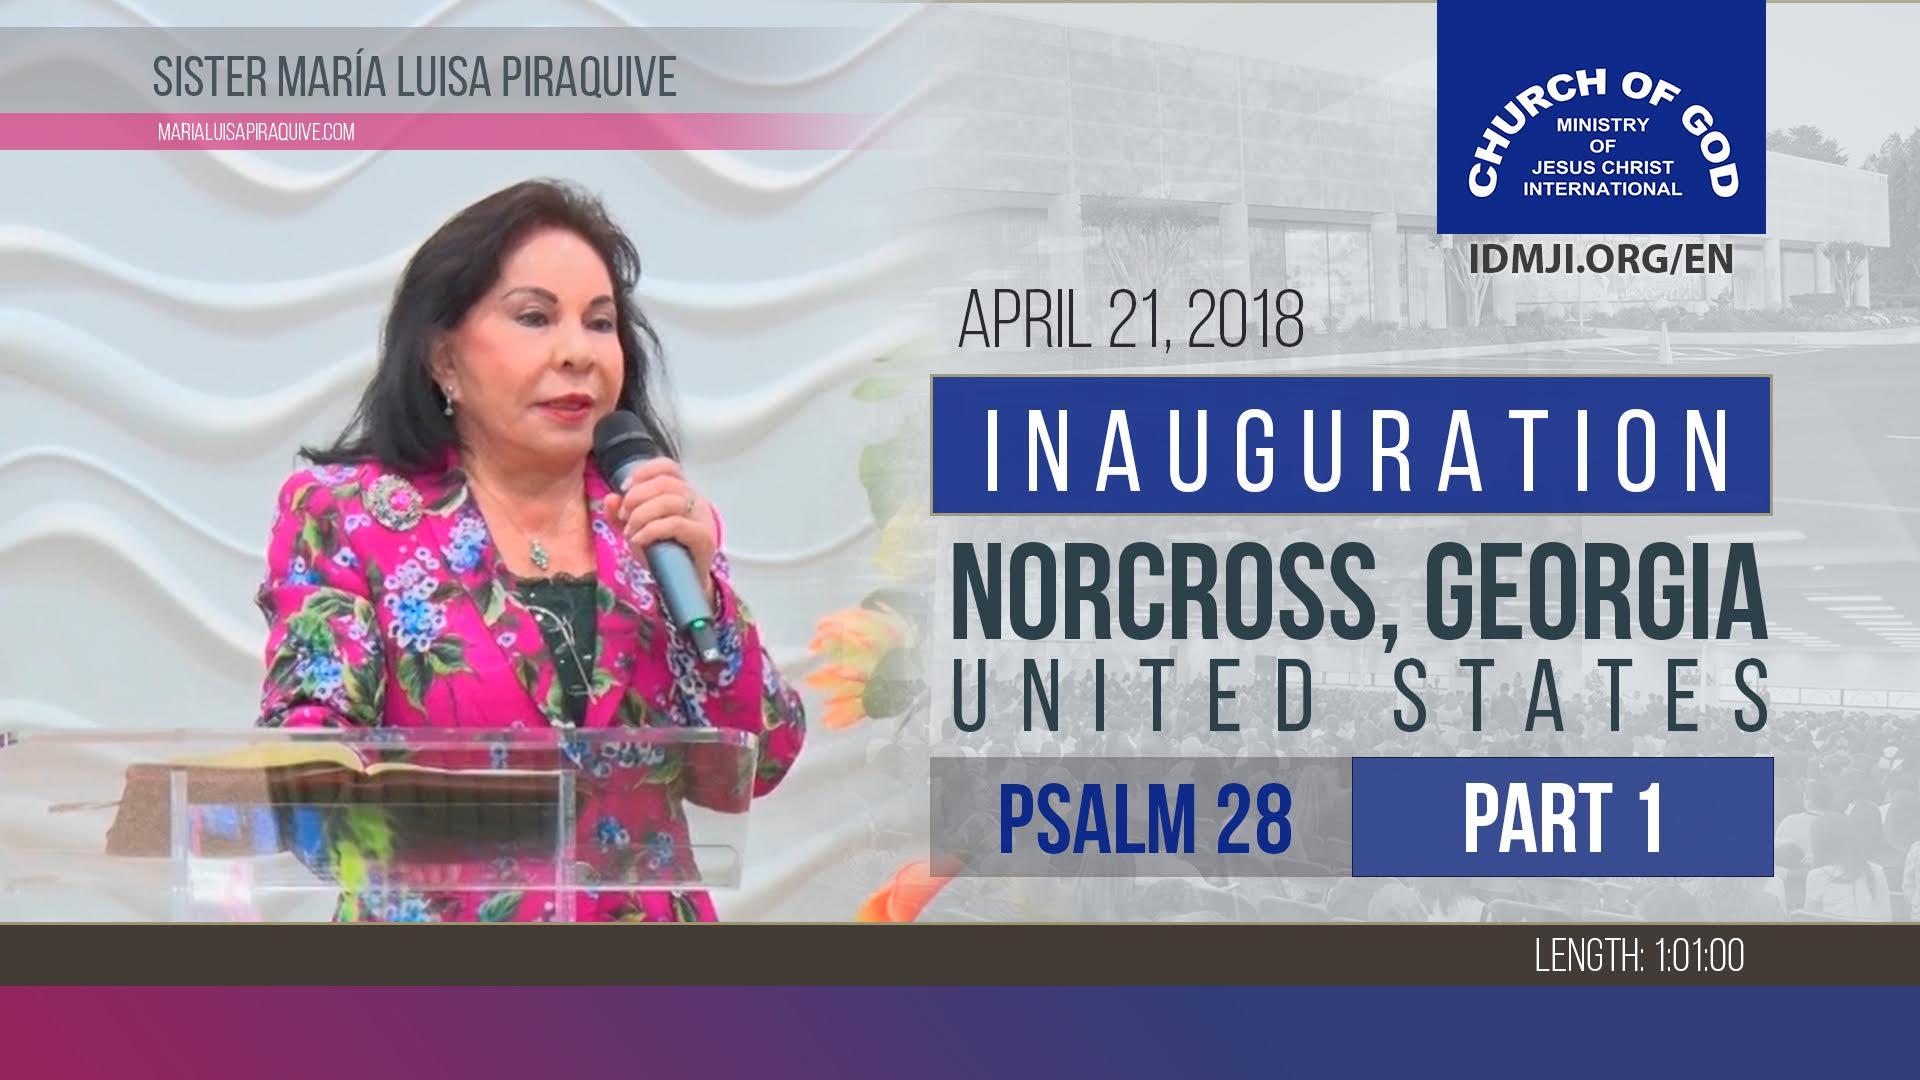 Inauguration Norcross, Georgia, United States (Part 1)